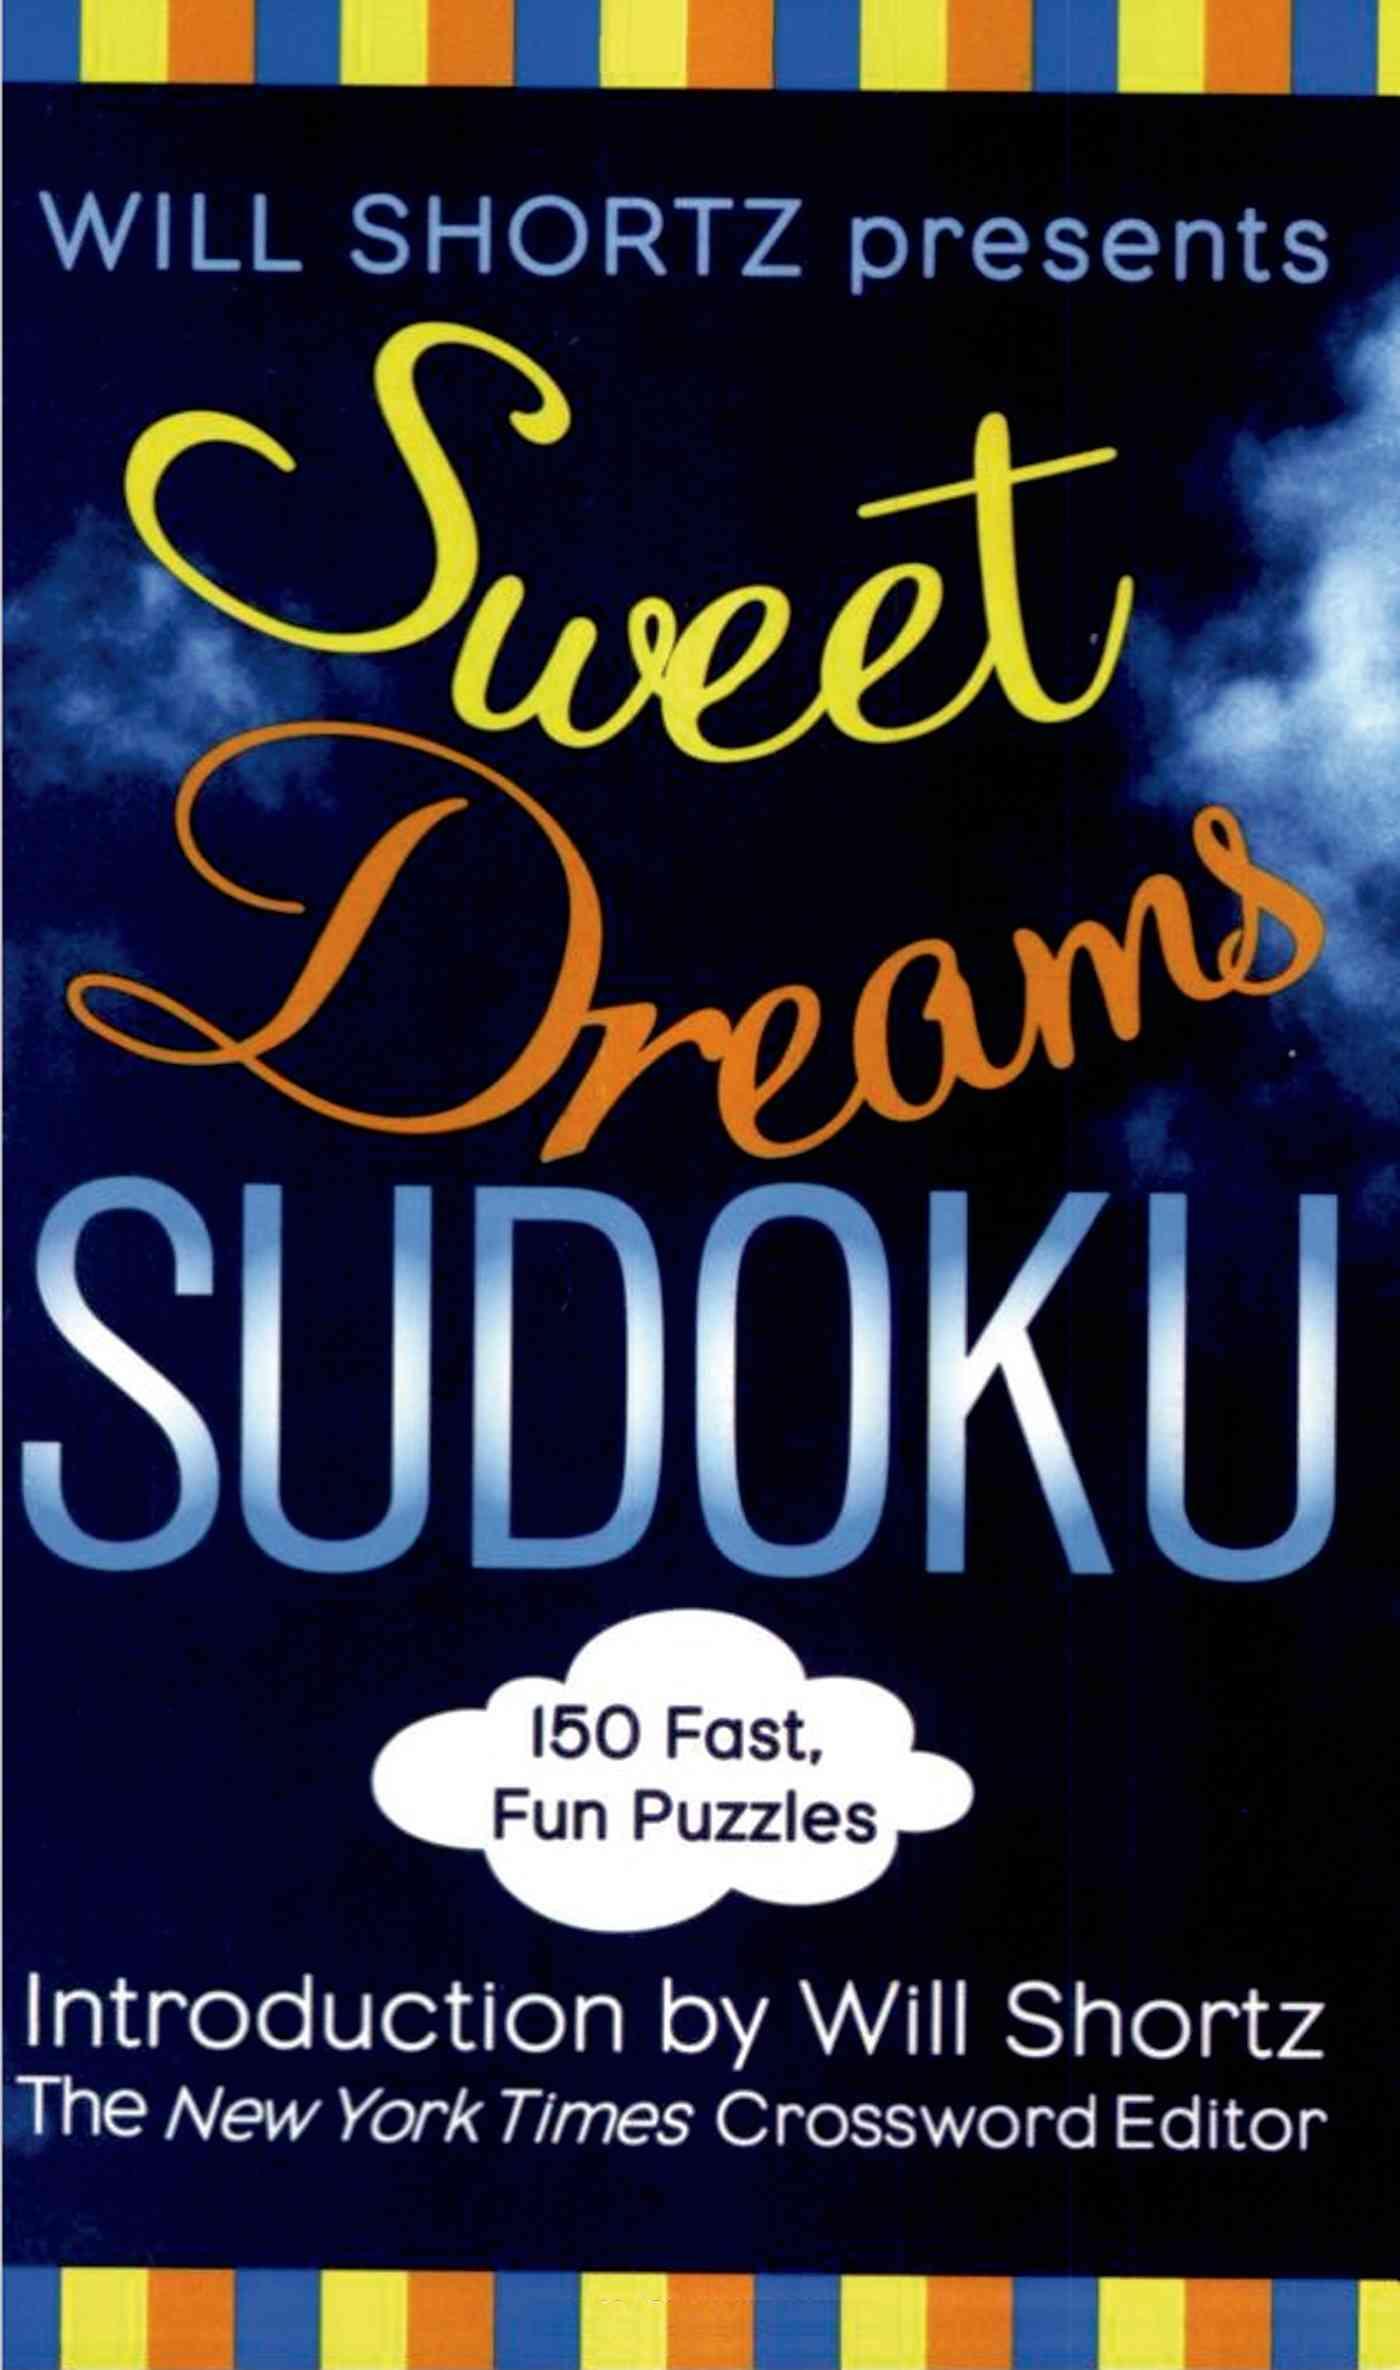 Will Shortz Presents Sweet Dreams Sudoku: 150 Fast, Fun Puzzles (Paperback)